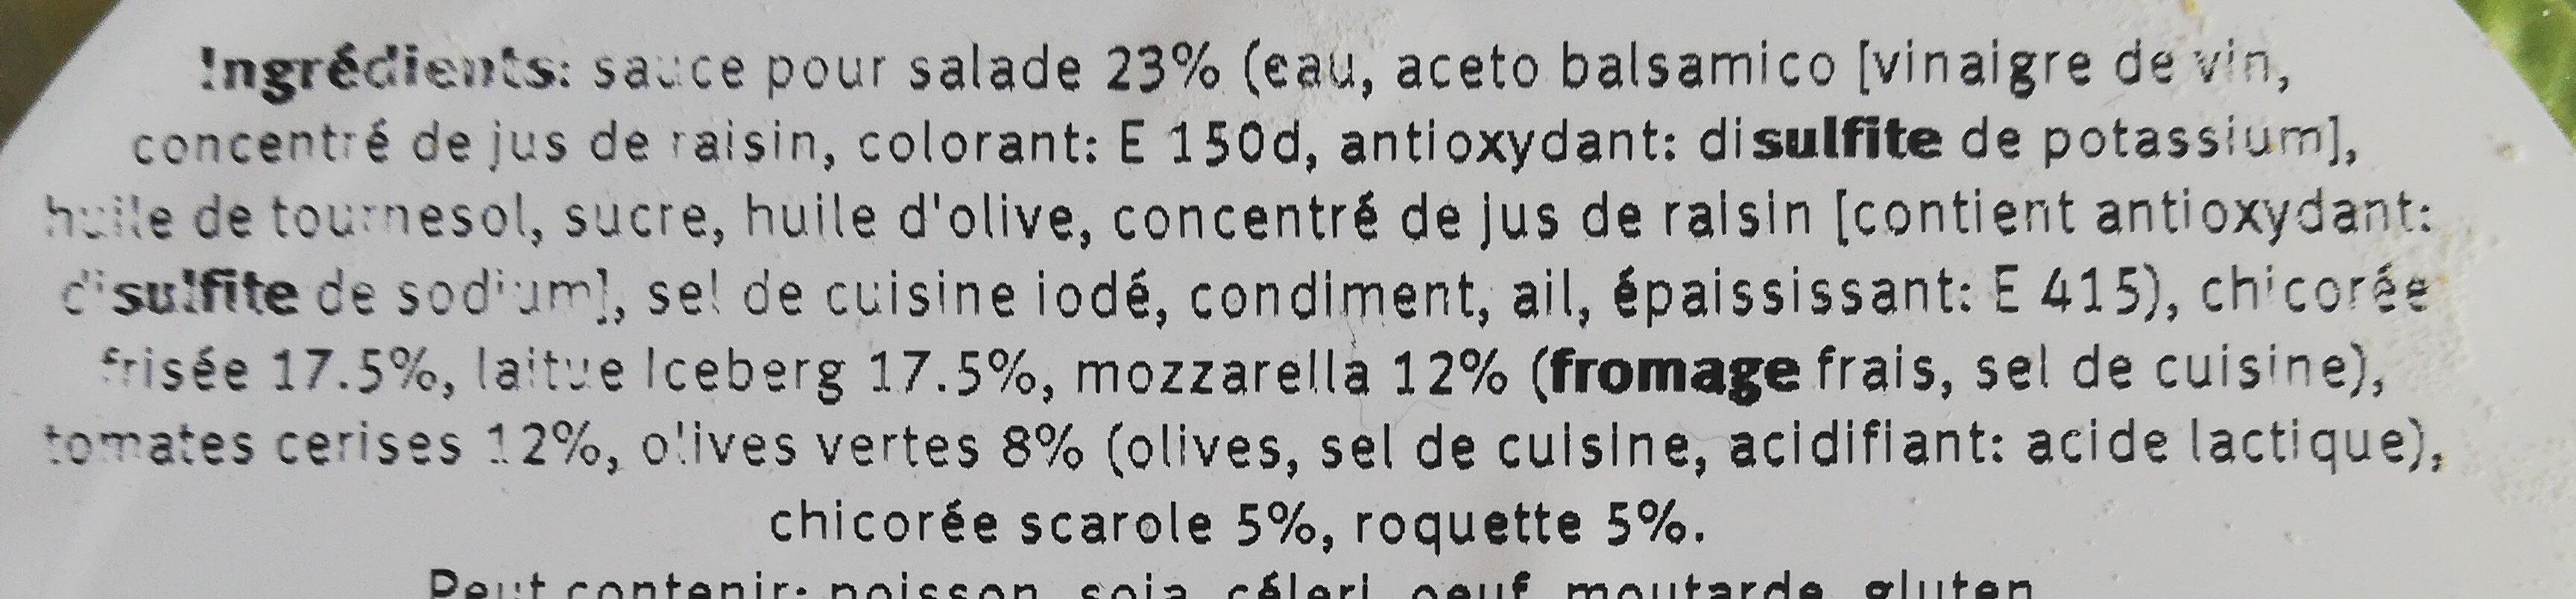 Saladbowl italian style - Ingredients - fr